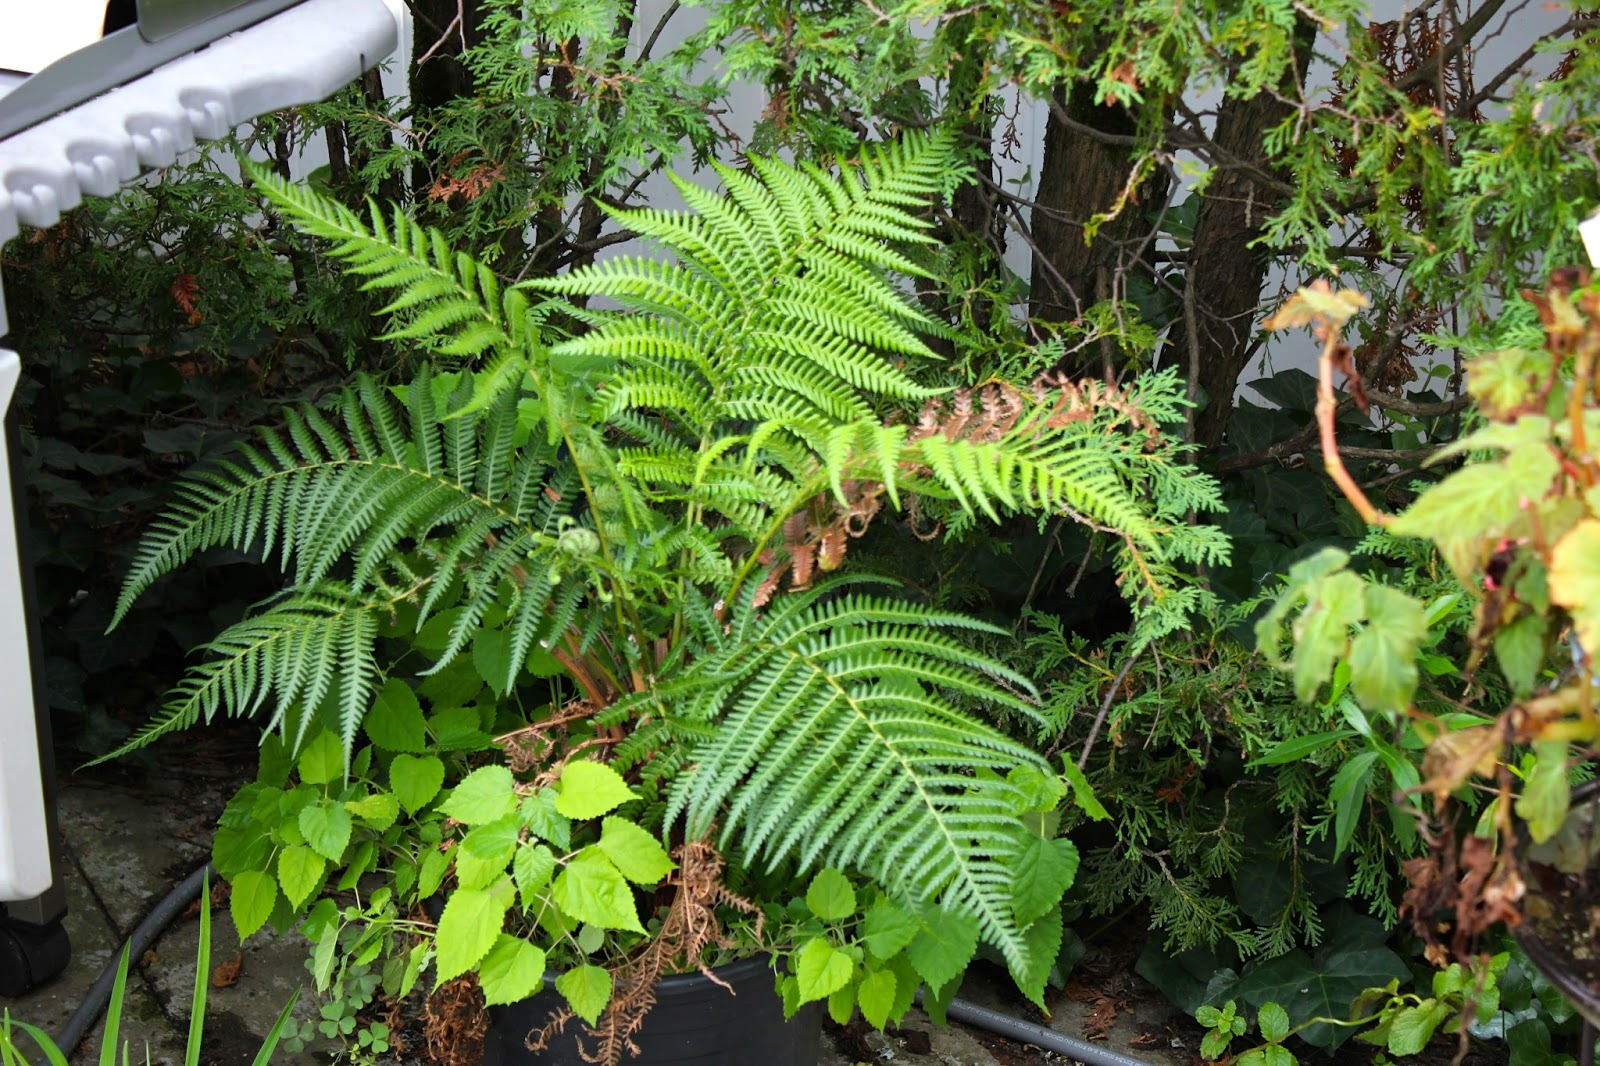 Tropical gardening in new york city dicksonia antarctica hardy tree fern - Hardy houseplants ...